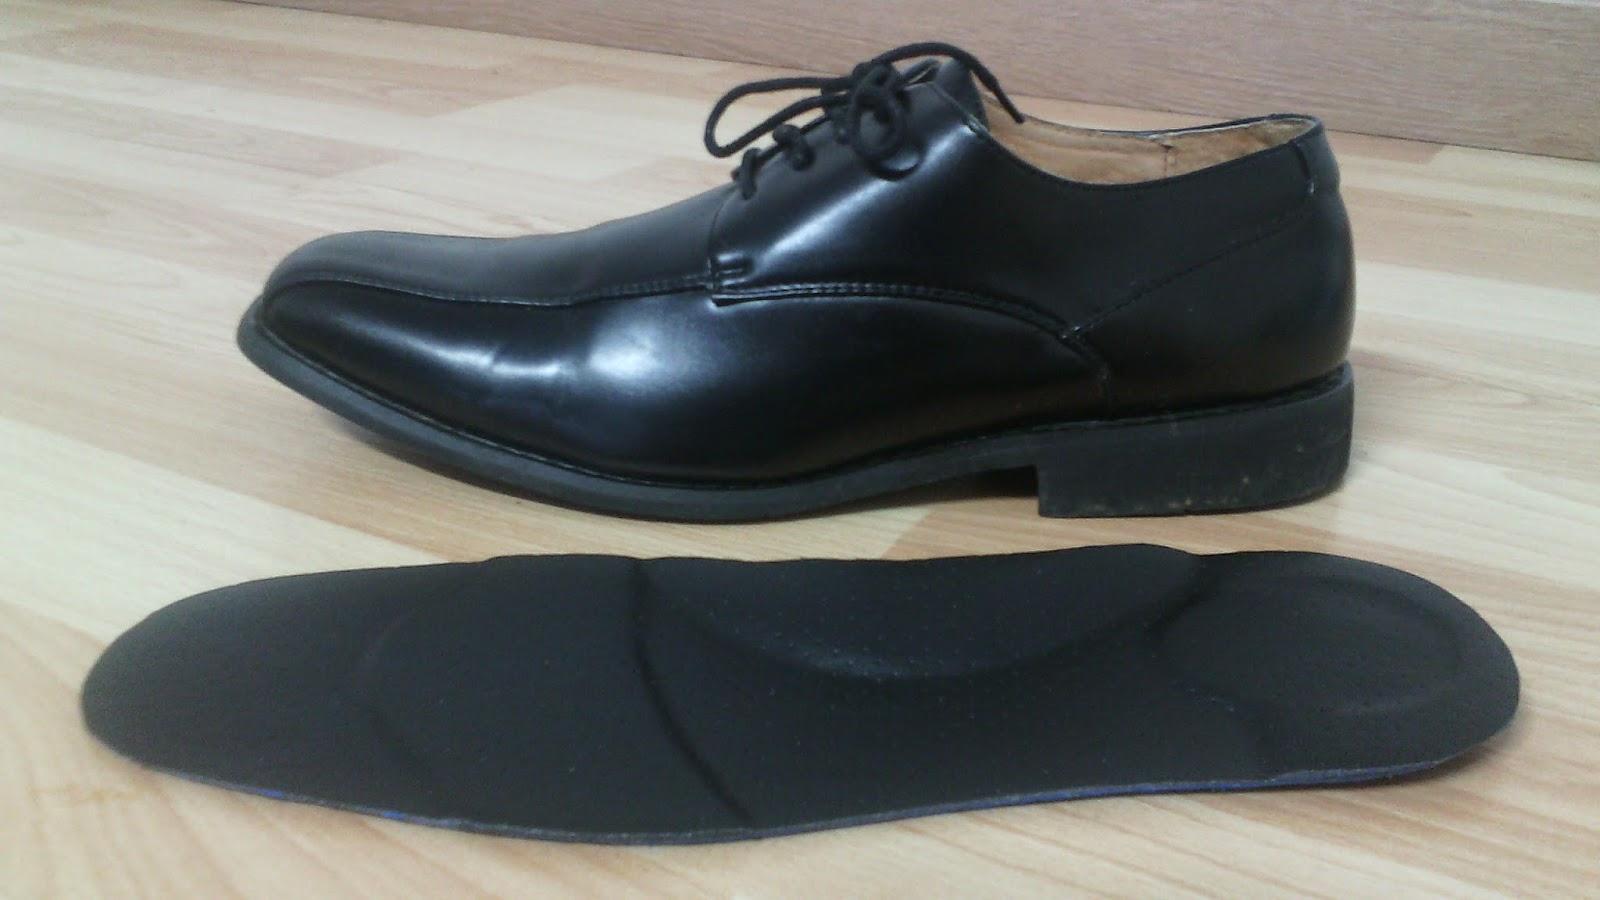 semelles orthopediques chaussures de ville. Black Bedroom Furniture Sets. Home Design Ideas